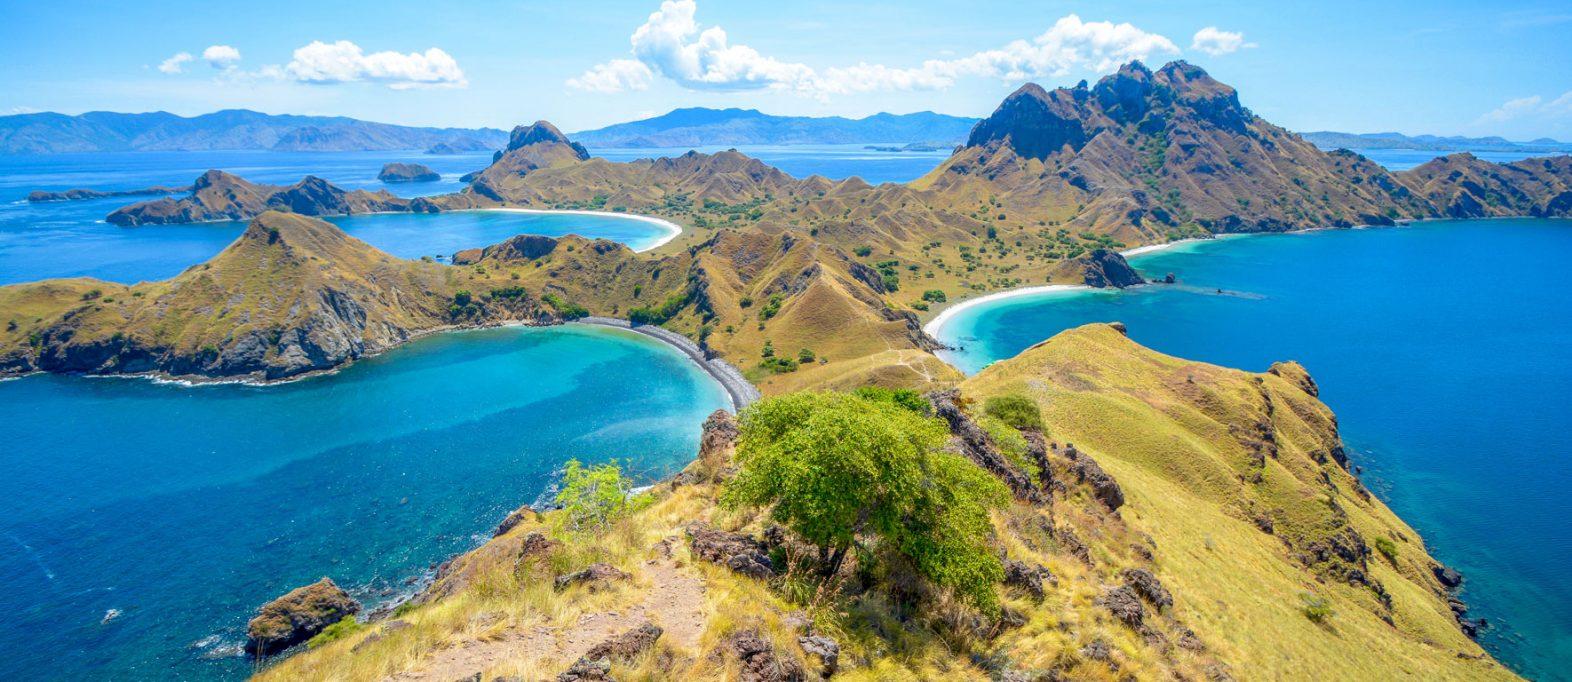 Padar Island, Sulawesi